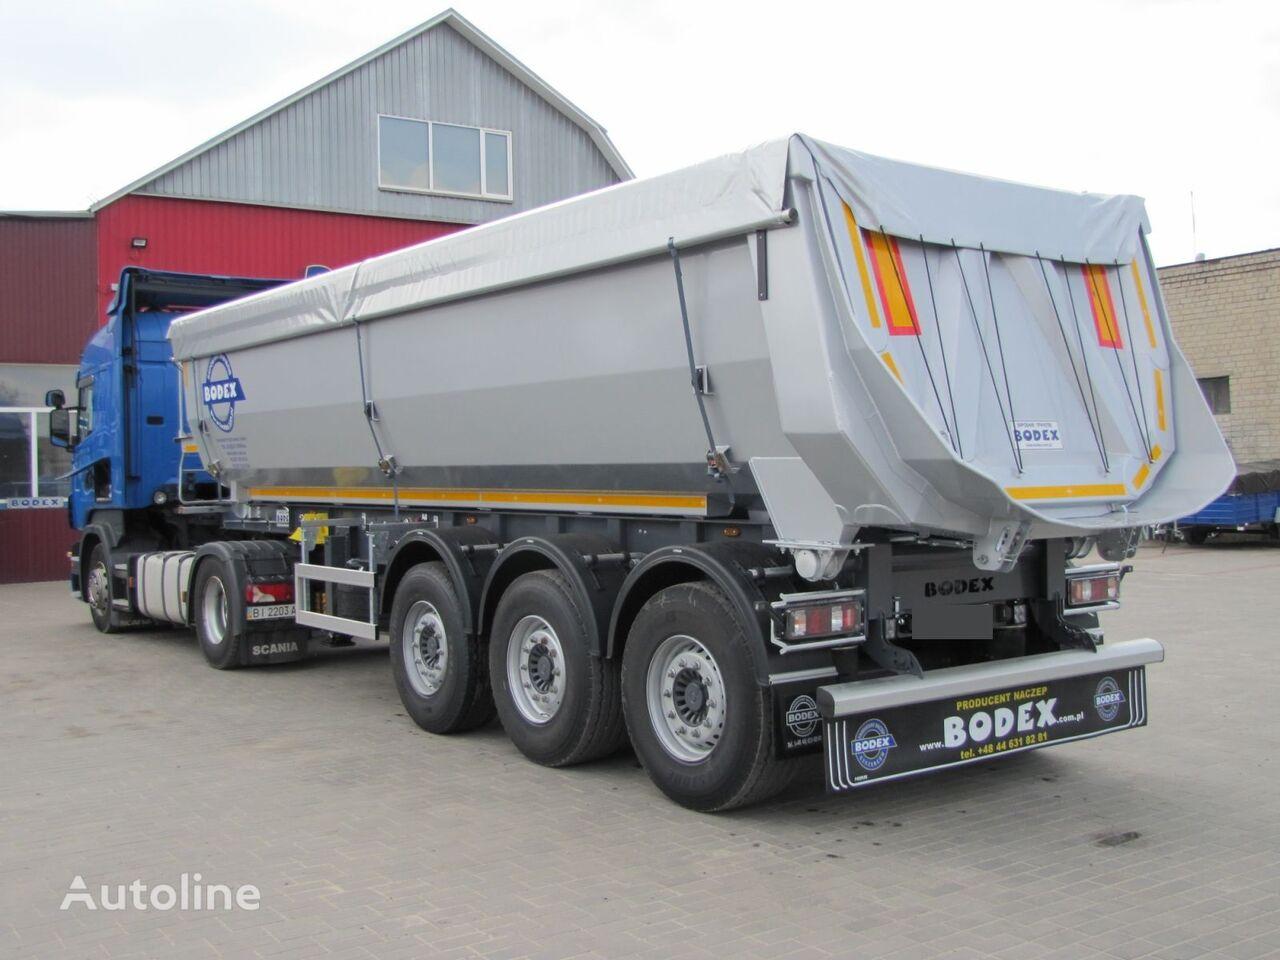 BODEX SAF 30 m3 SAF HARDOX Intrax Osi obsluzheni gotoviy v robotu! tipper semi-trailer